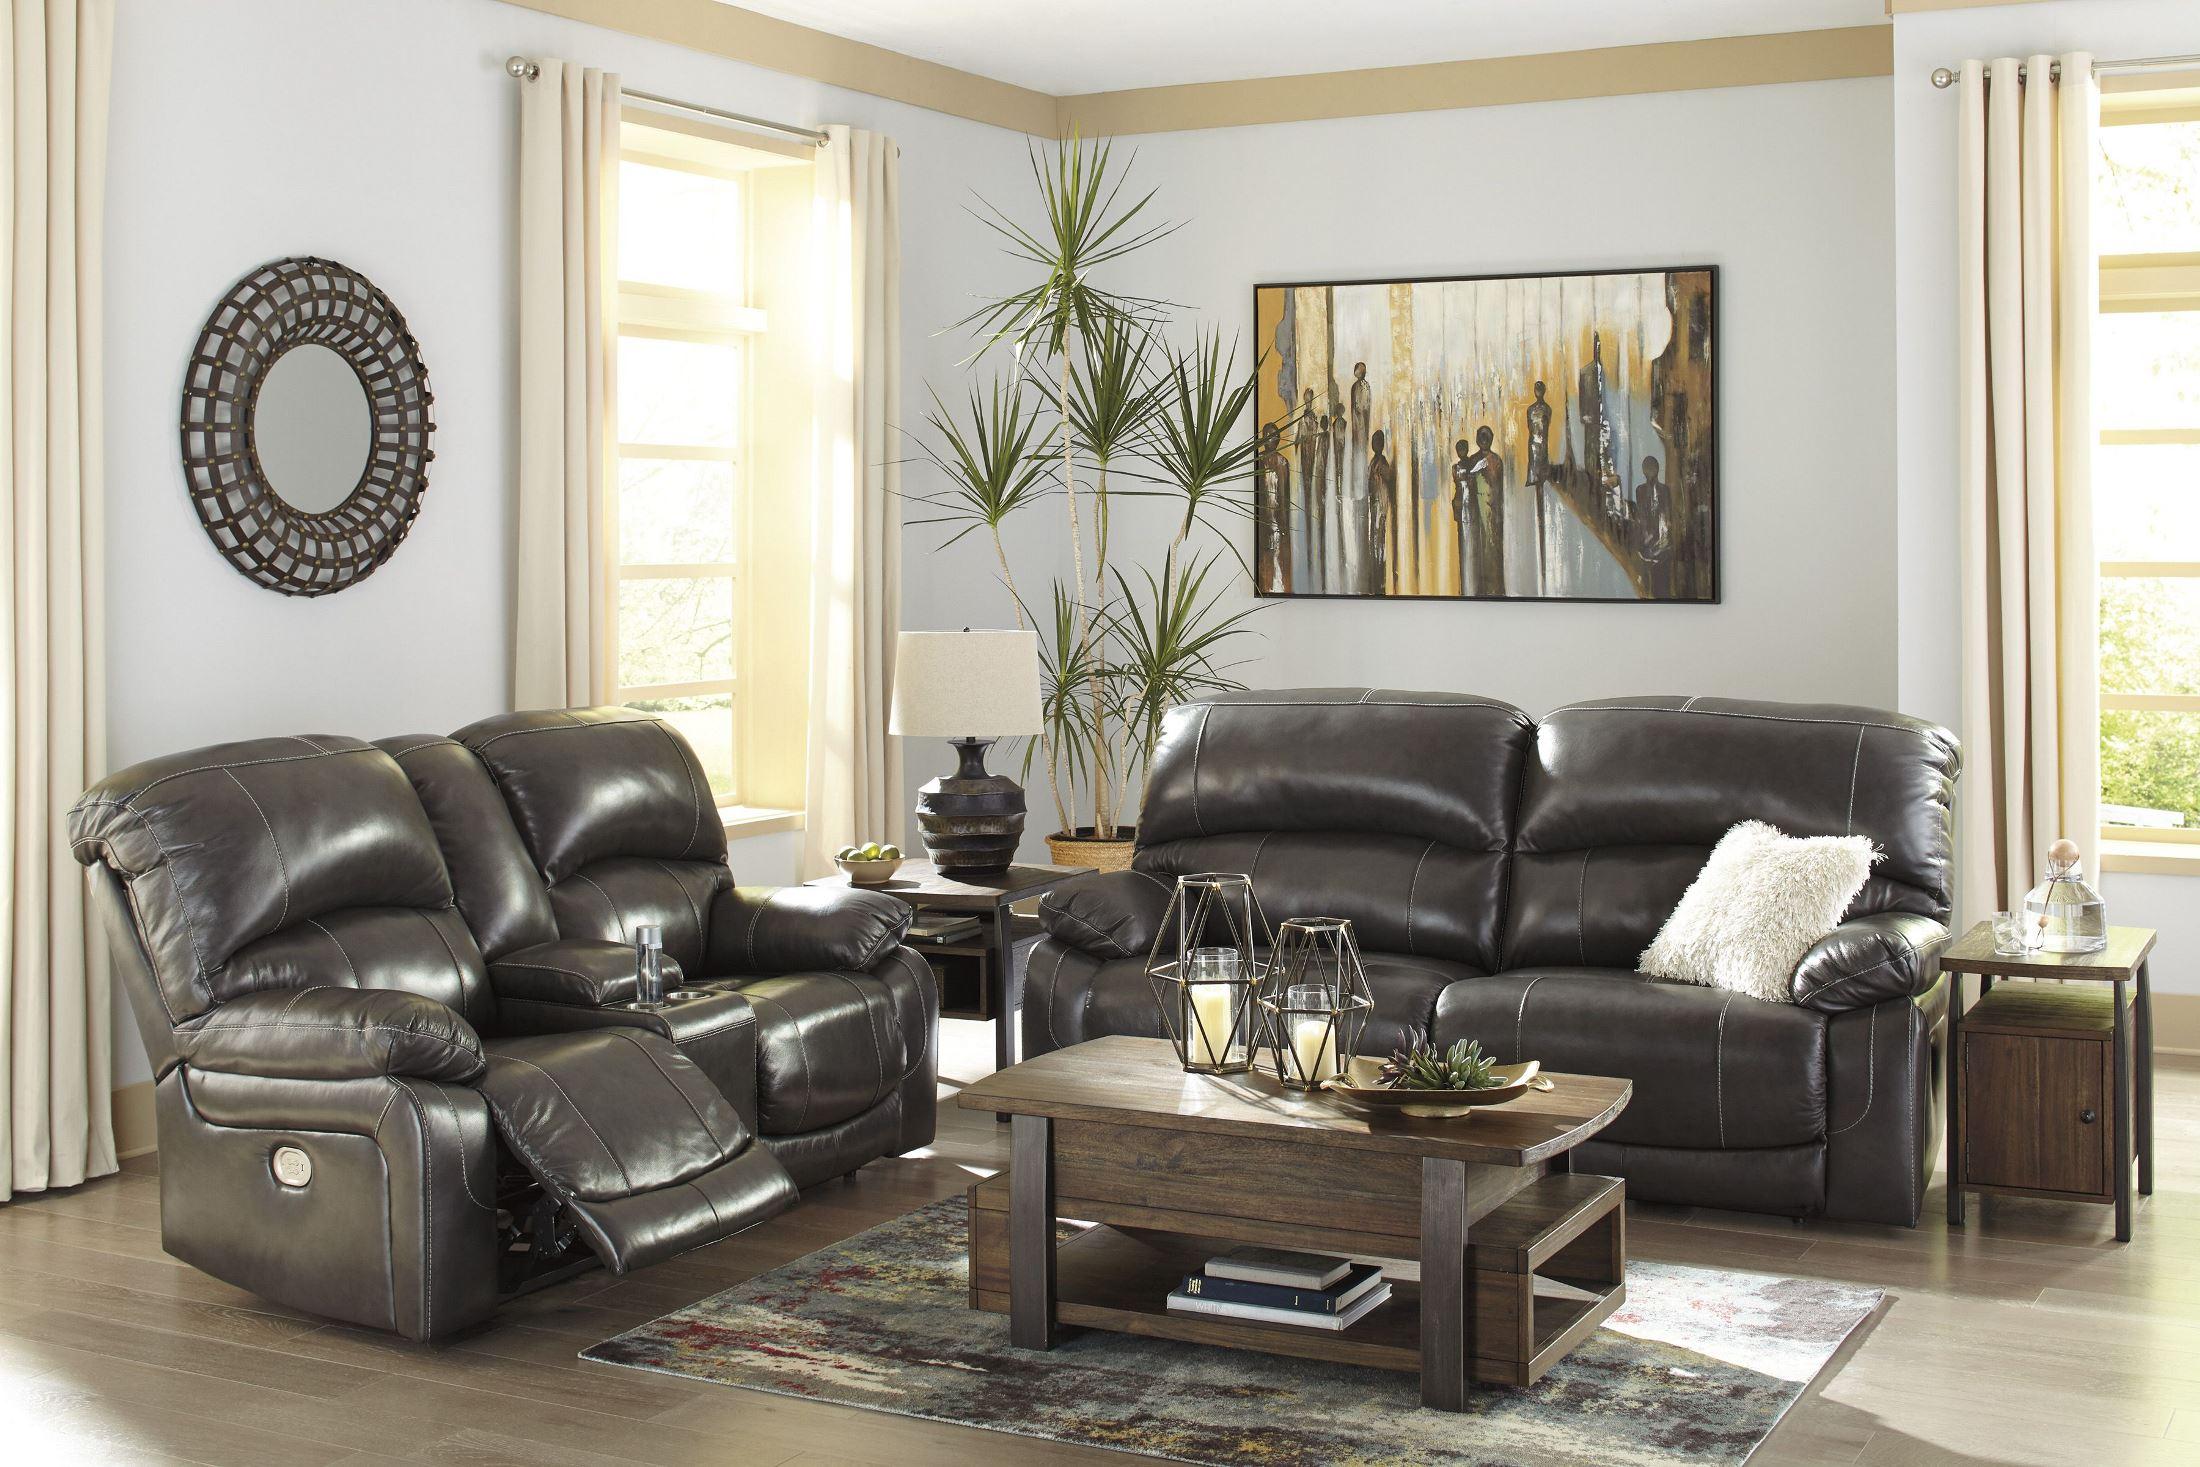 Hallstrung Gray 2 Seat Power Reclining Living Room Set 1stopbedrooms